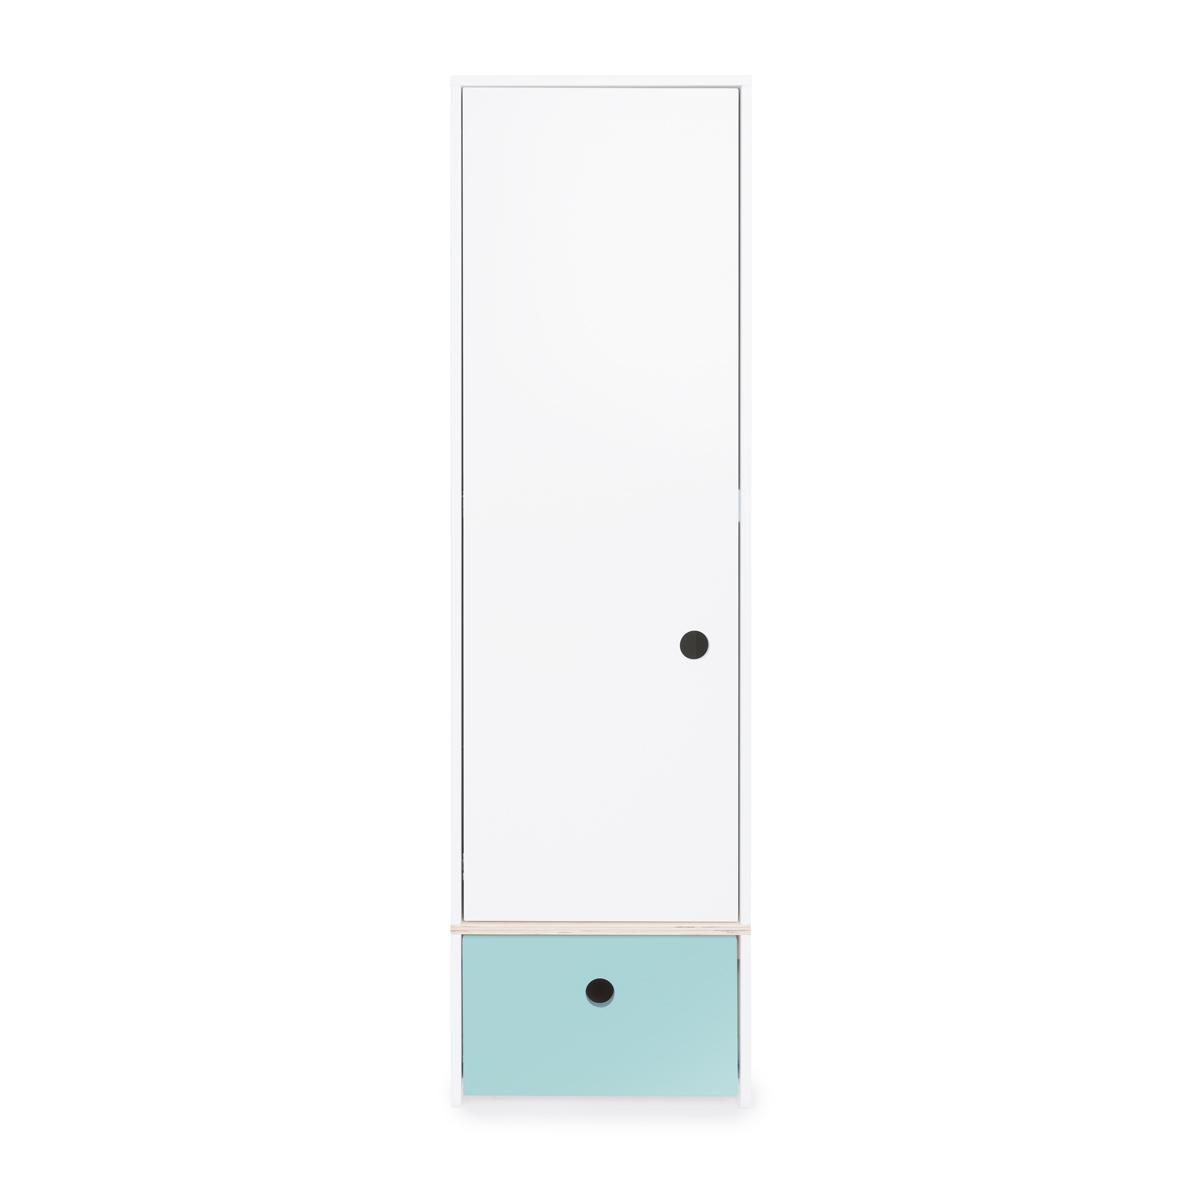 Armoire 1 porte façade tiroir bleu ciel